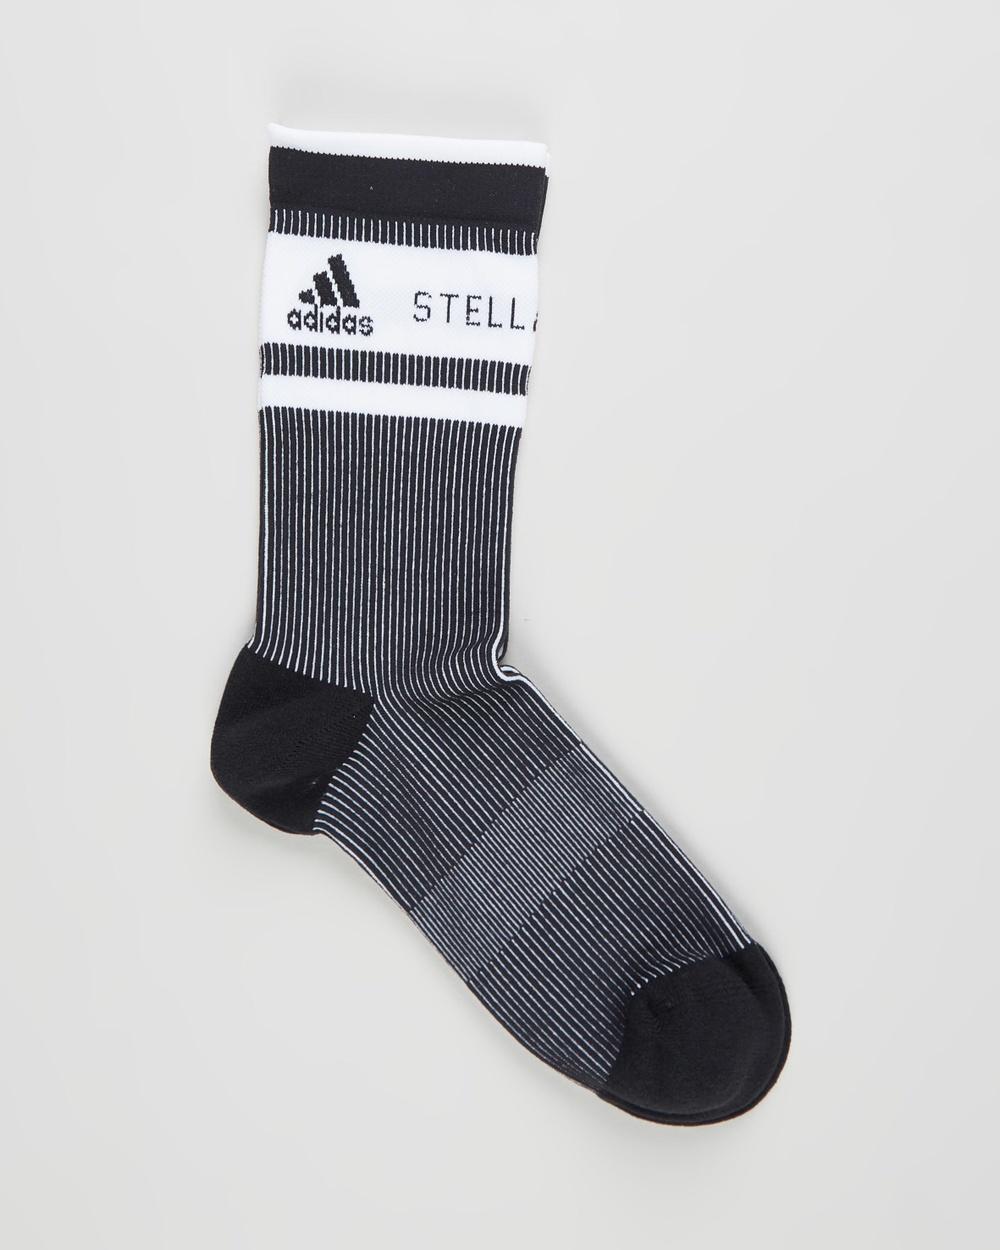 adidas by Stella McCartney ASMC Crew Socks Black, Black & White